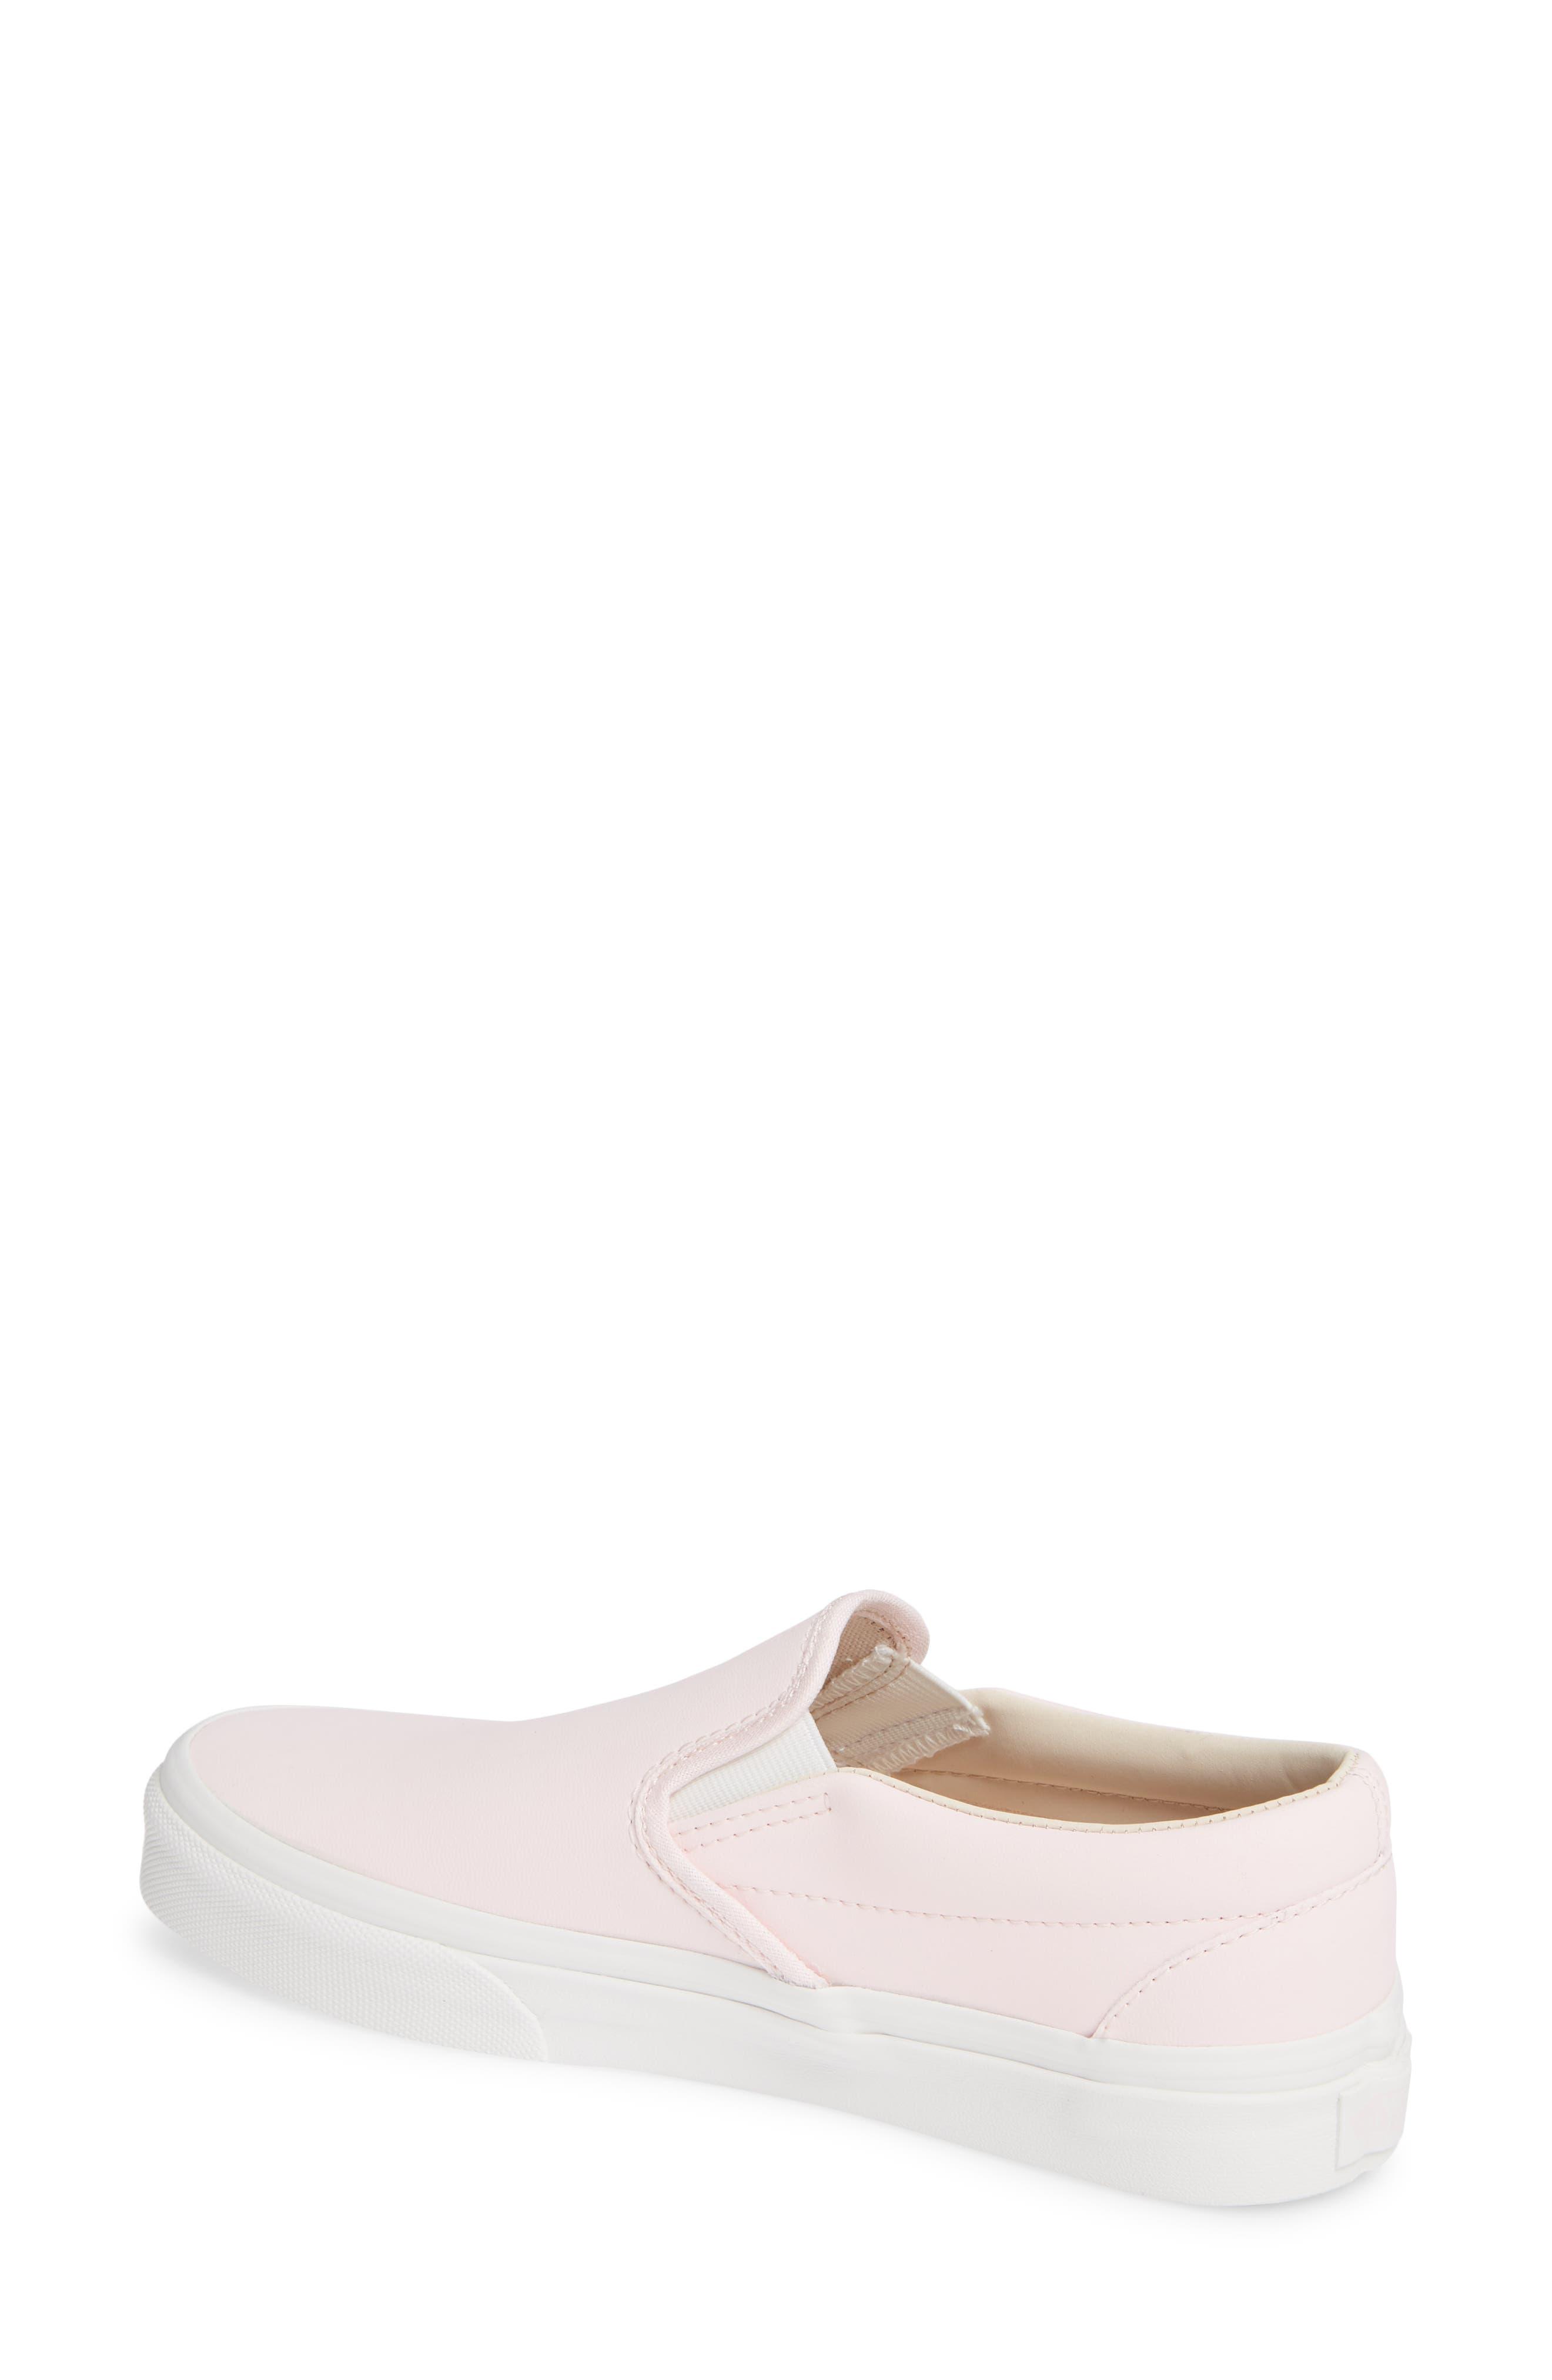 UA Classic Slip-On Sneaker,                             Alternate thumbnail 2, color,                             680